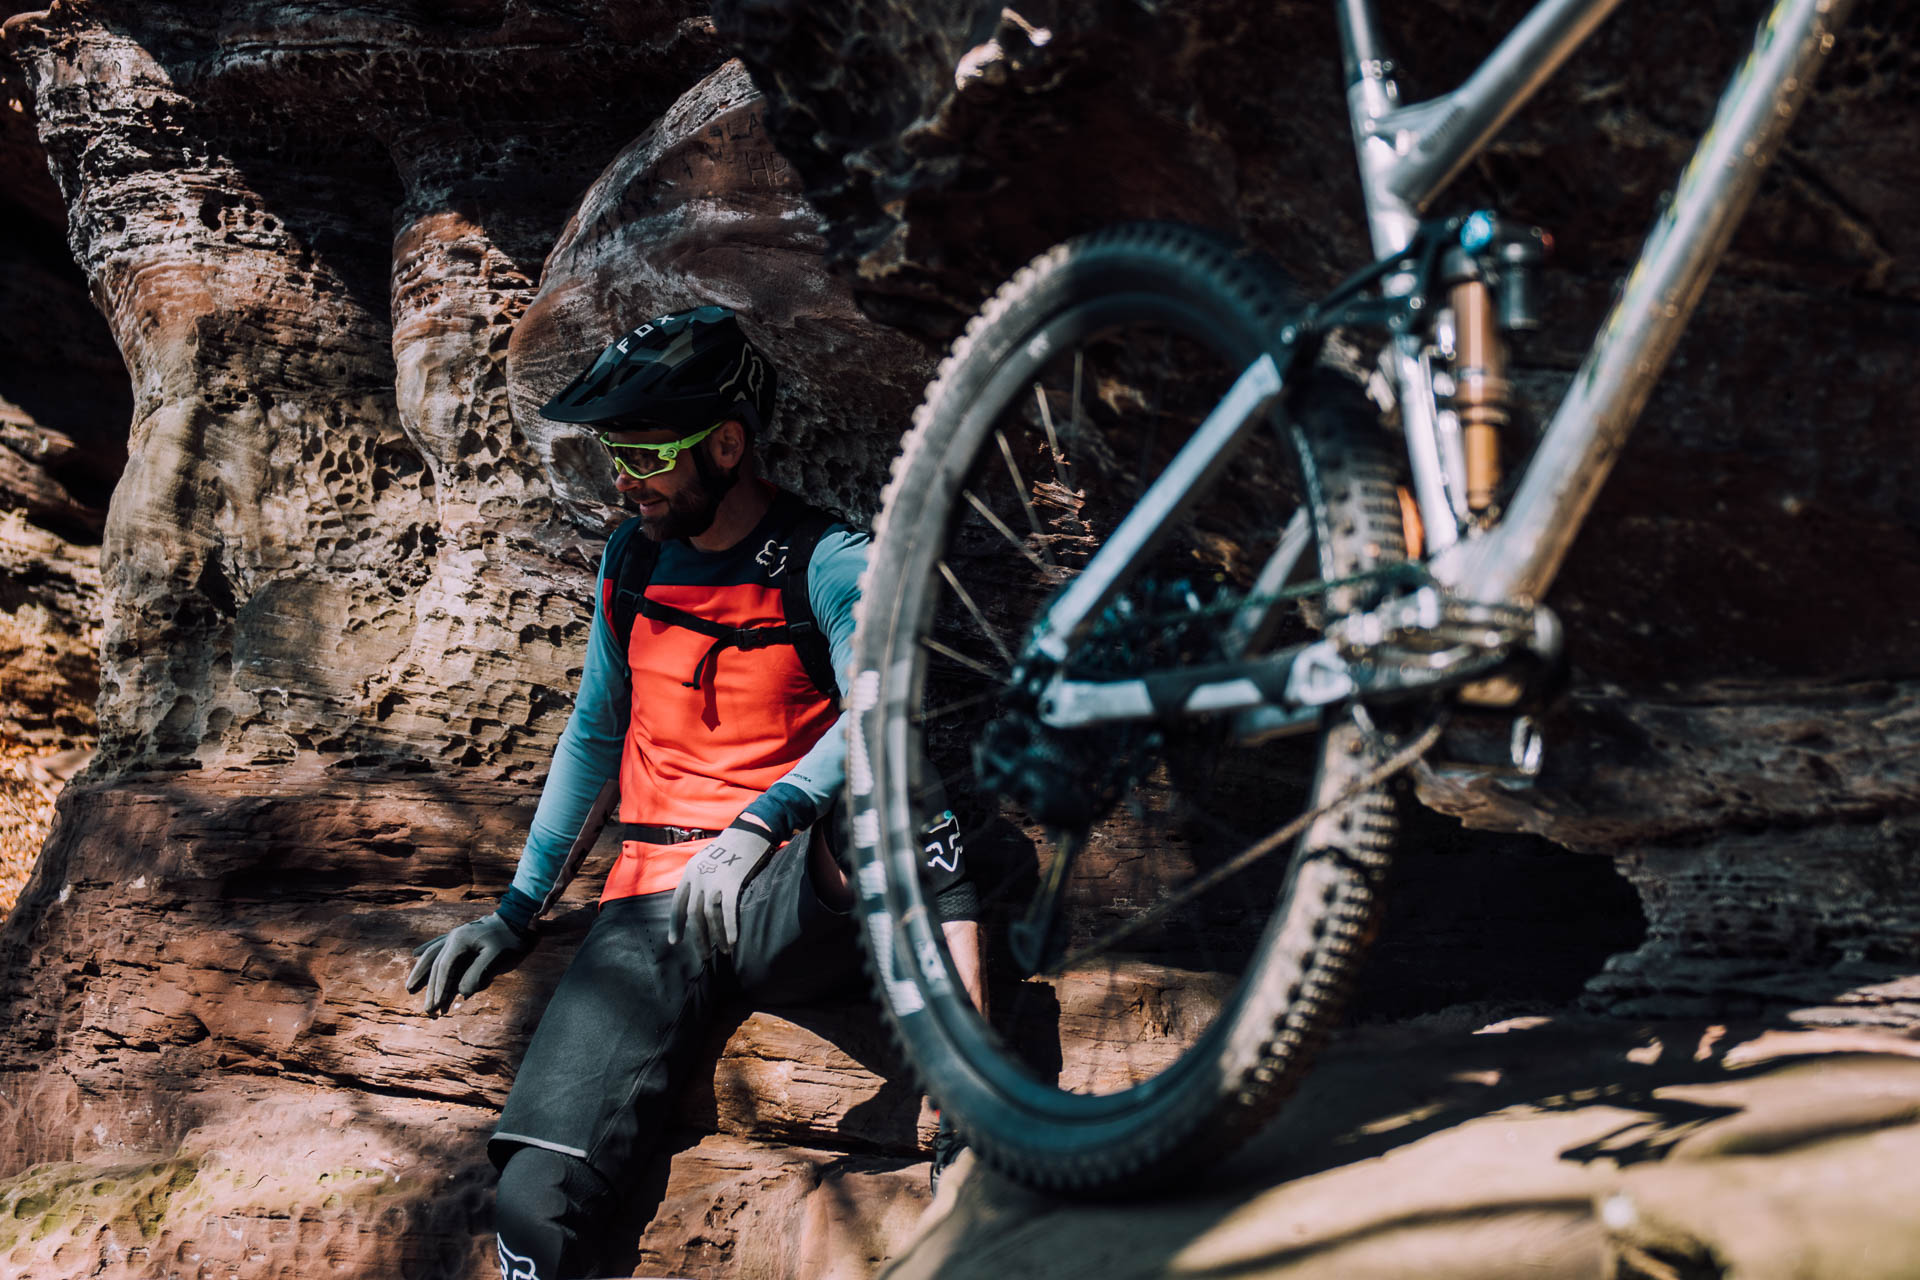 mountainbiker sitzt neben bike